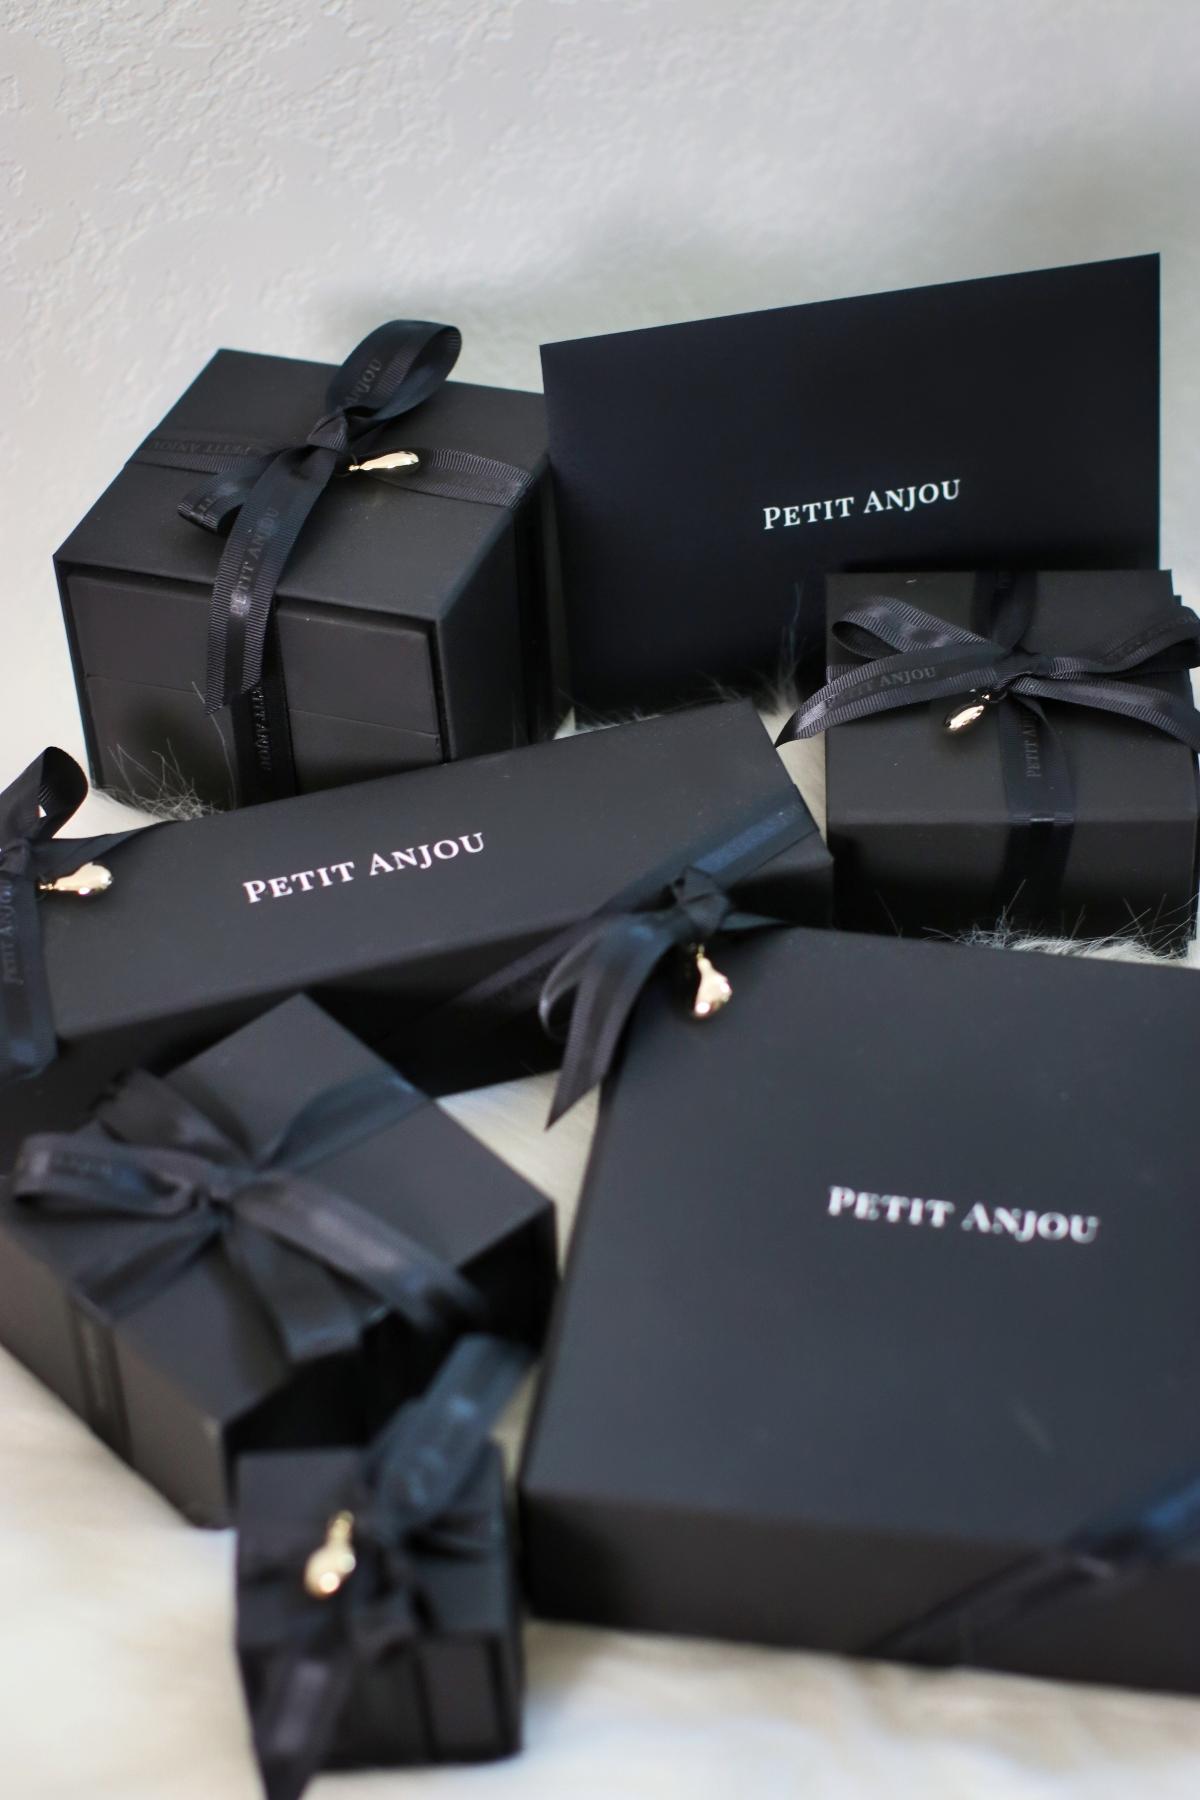 Petit Anjou Fine Jewelry Based in Newport Coast